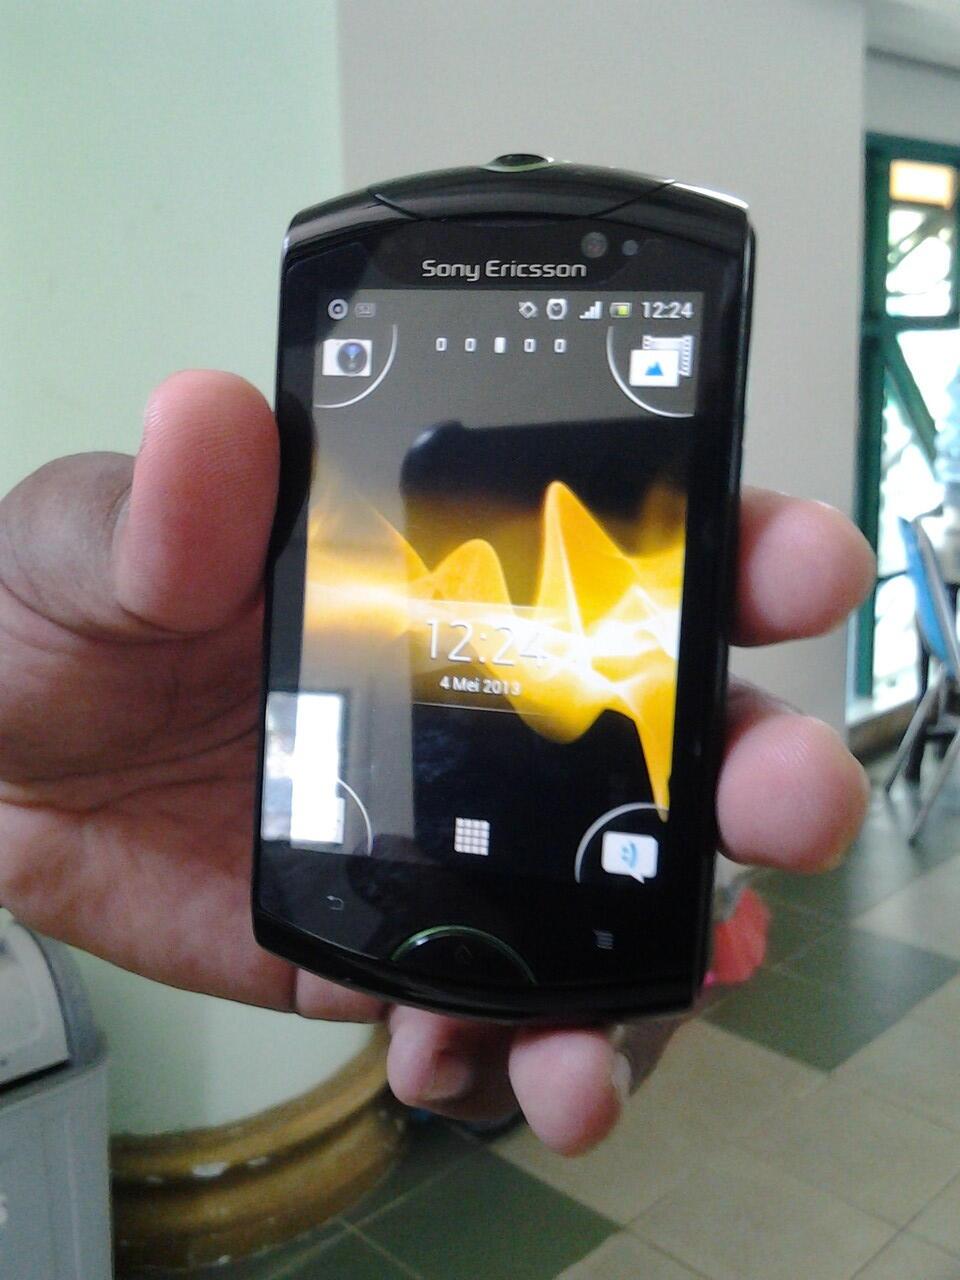 Jual Sony Ericsson Live with Walkman - WT19i (Black) jogja